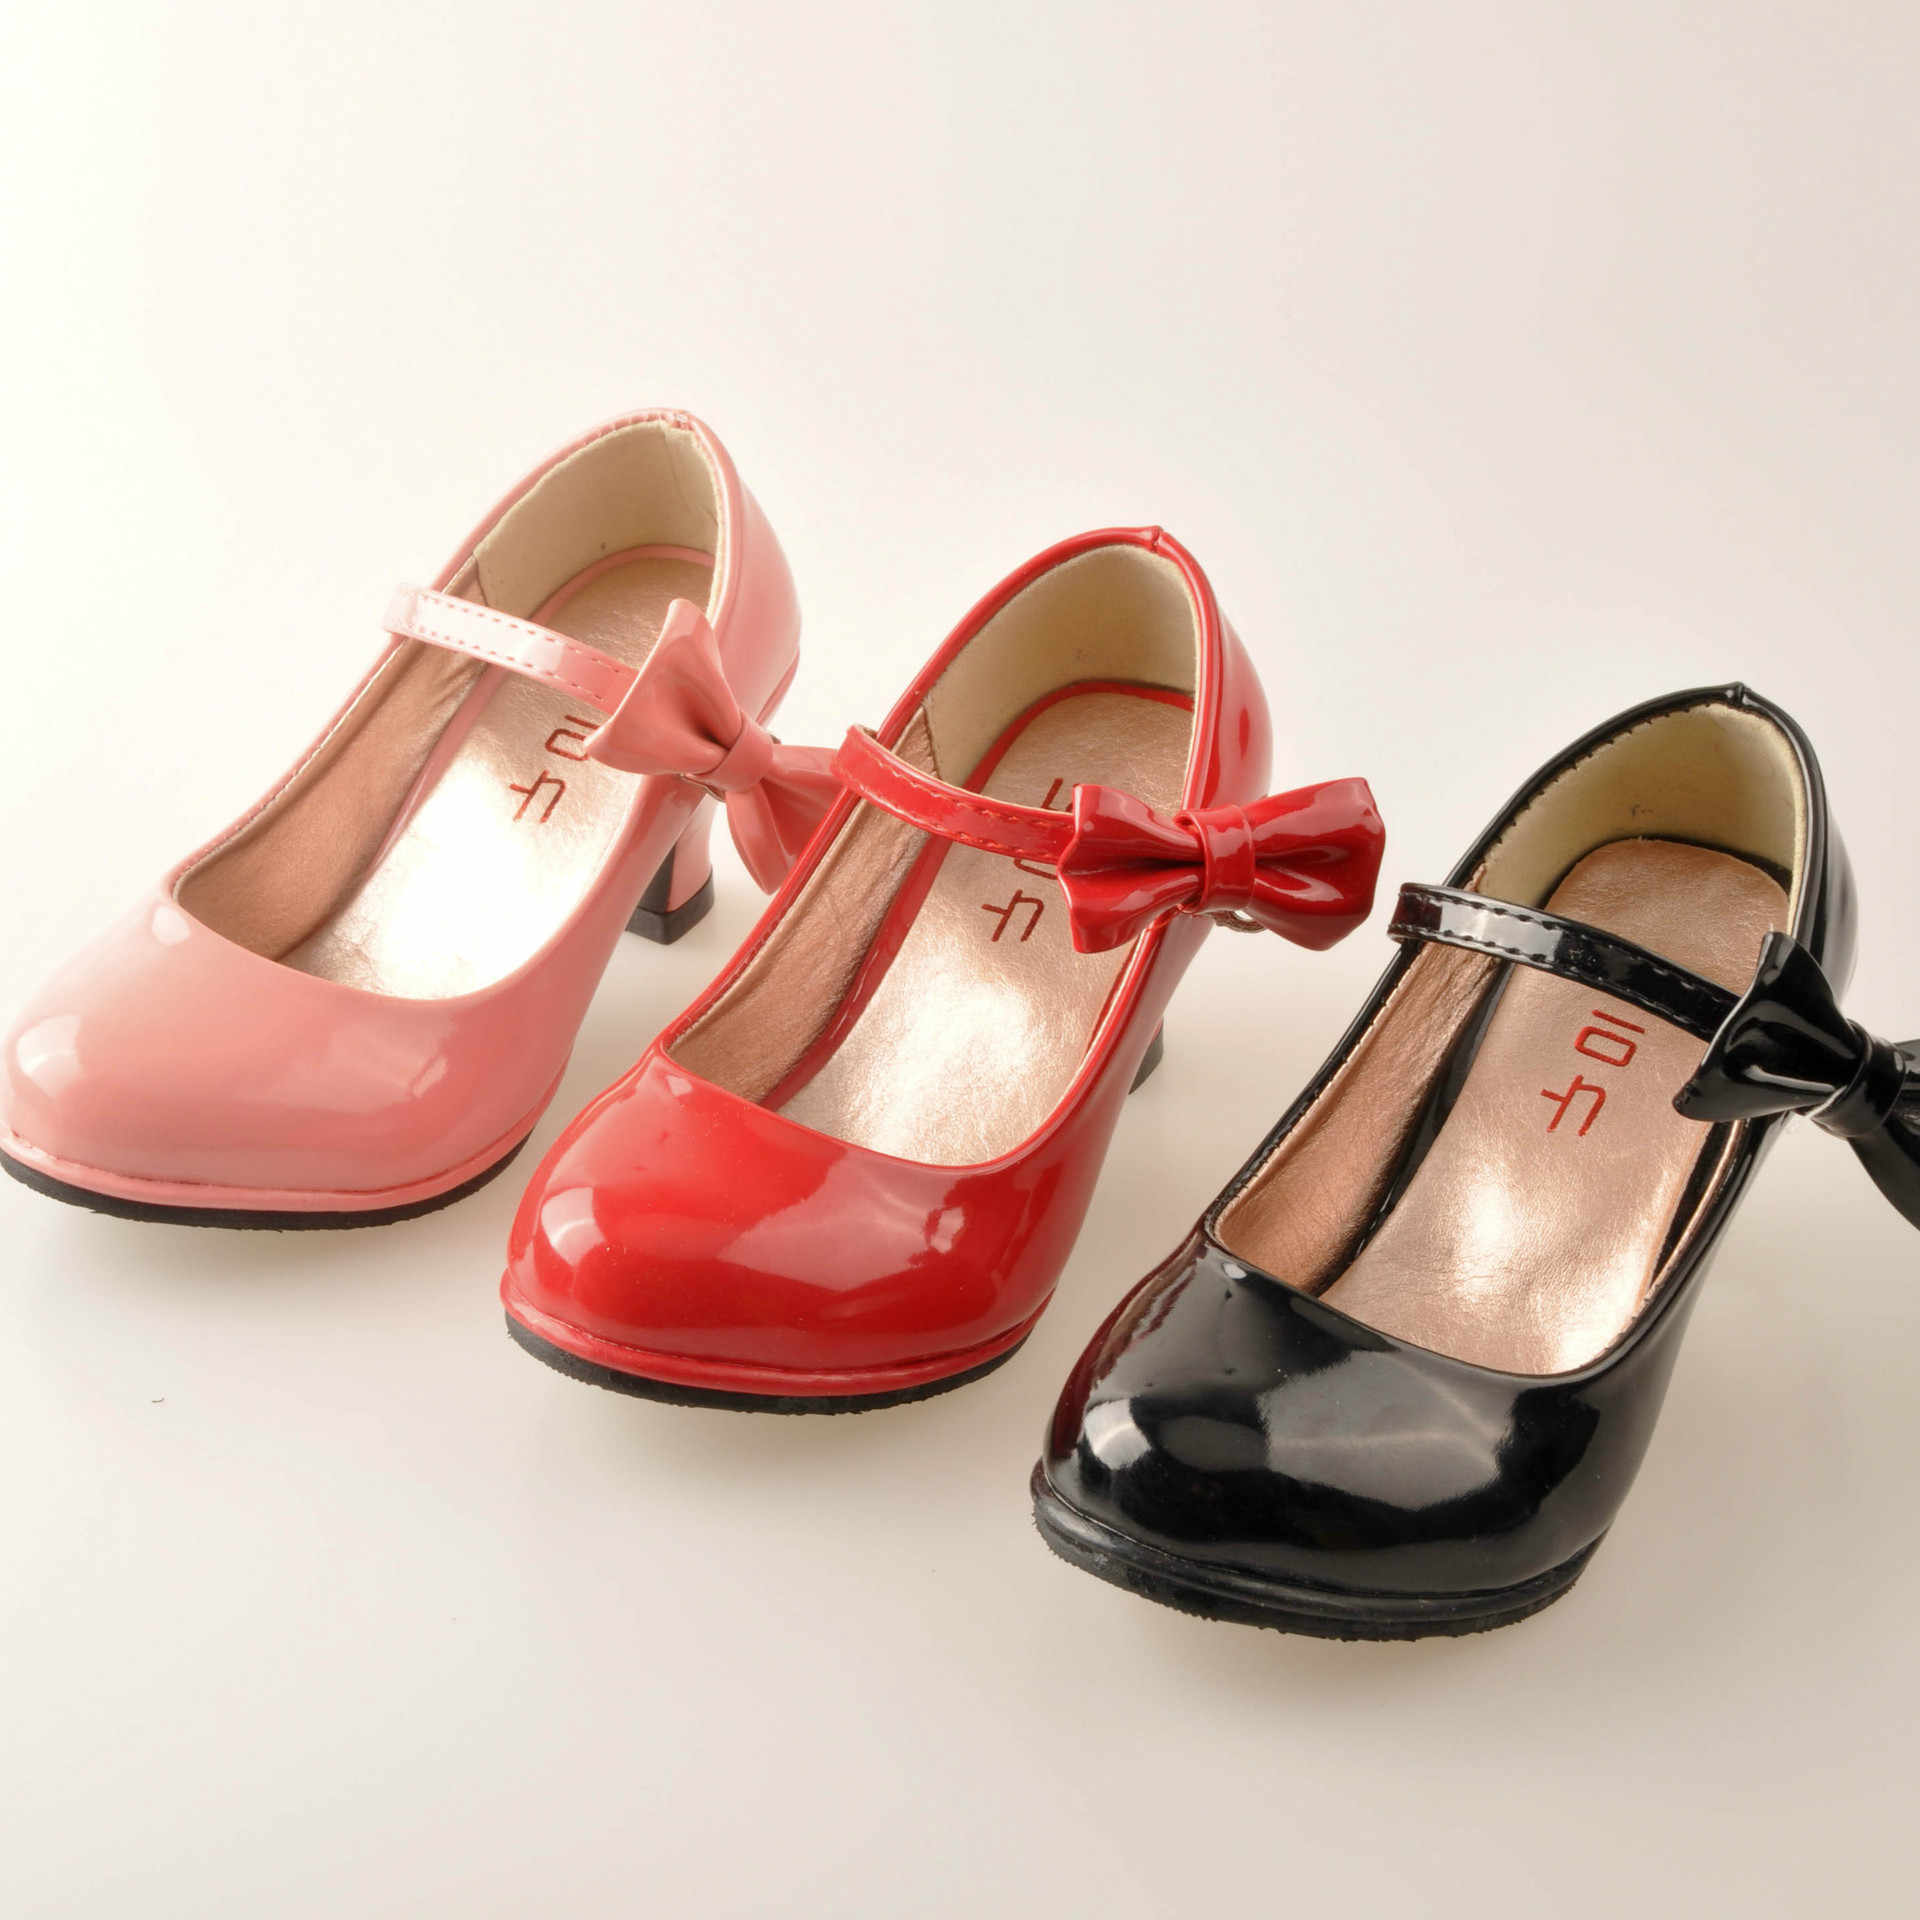 35 Princess Kids Party Girls Shoes